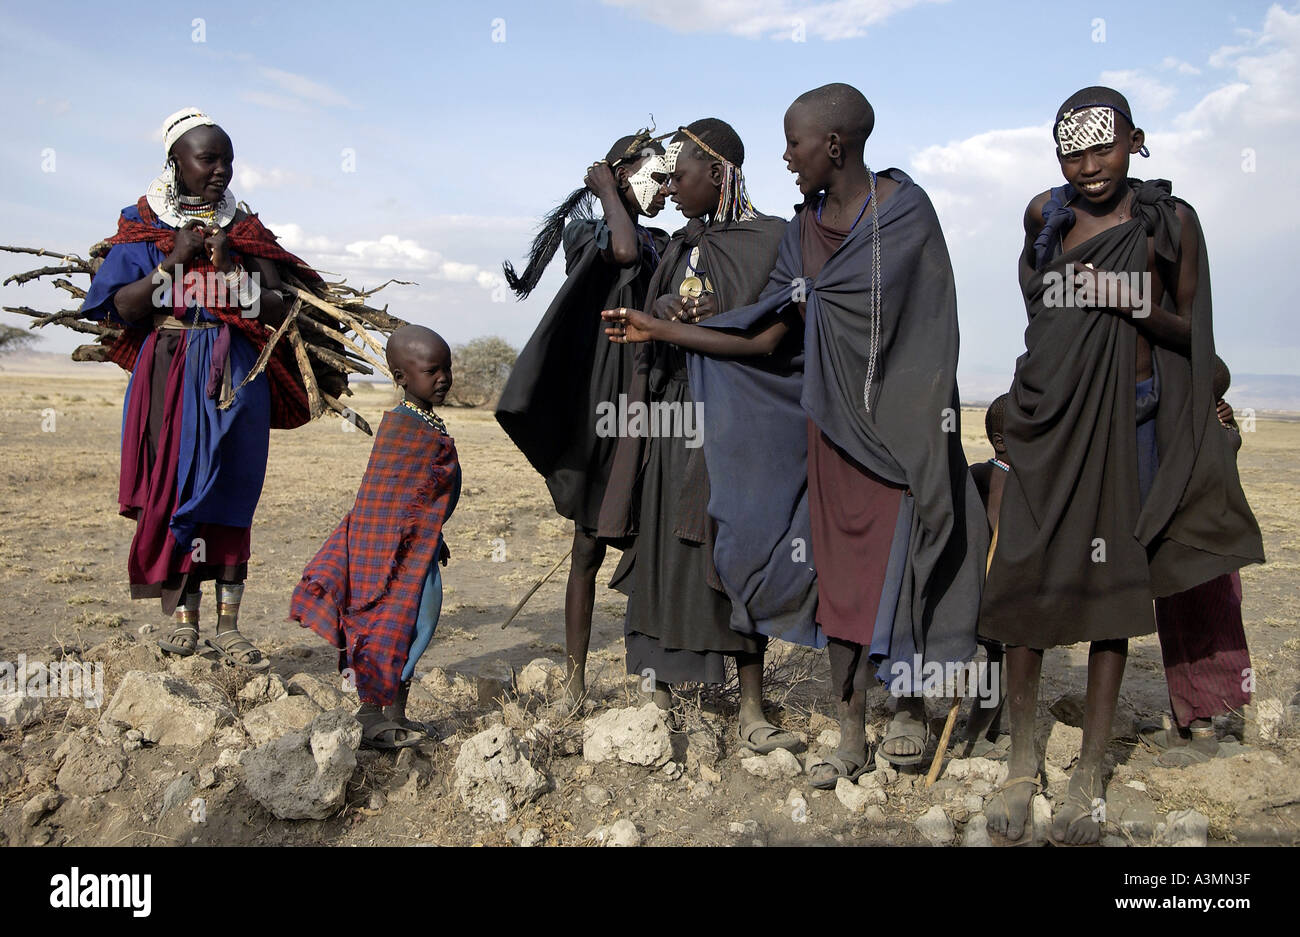 Junge beschnitten vor kurzem Masai Krieger und Masai Mädchen in den Serengei-Ebenen-Tansania Stockbild